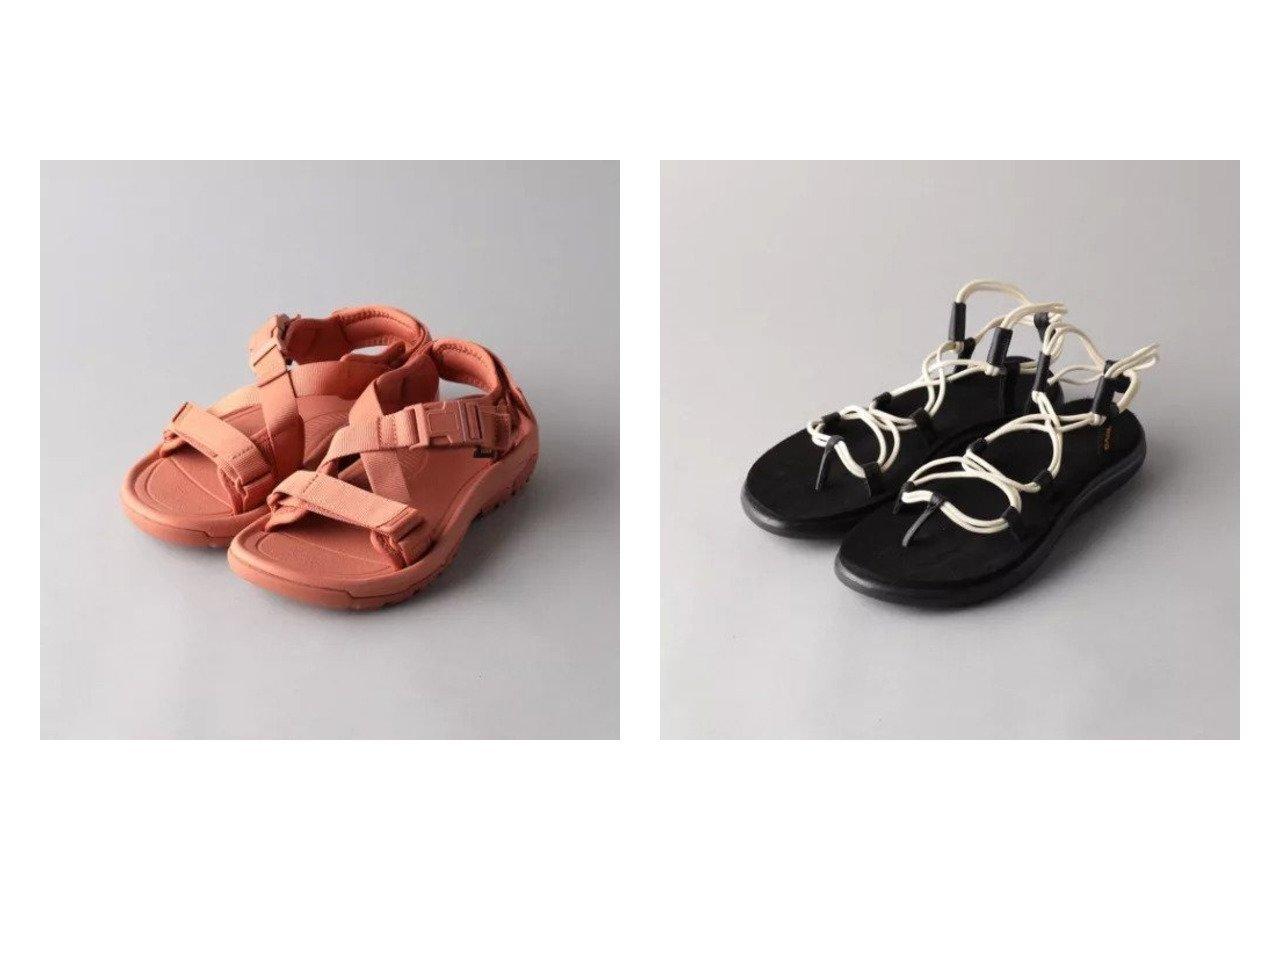 【Odette e Odile/オデット エ オディール】のTEVA HURRICANE VERGE&TEVA VOYA INFINITY 【シューズ・靴】おすすめ!人気、トレンド・レディースファッションの通販 おすすめで人気の流行・トレンド、ファッションの通販商品 メンズファッション・キッズファッション・インテリア・家具・レディースファッション・服の通販 founy(ファニー) https://founy.com/ ファッション Fashion レディースファッション WOMEN S/S・春夏 SS・Spring/Summer サンダル シューズ スポーツ フィット フェミニン 人気 春 Spring おすすめ Recommend インソール  ID:crp329100000030397